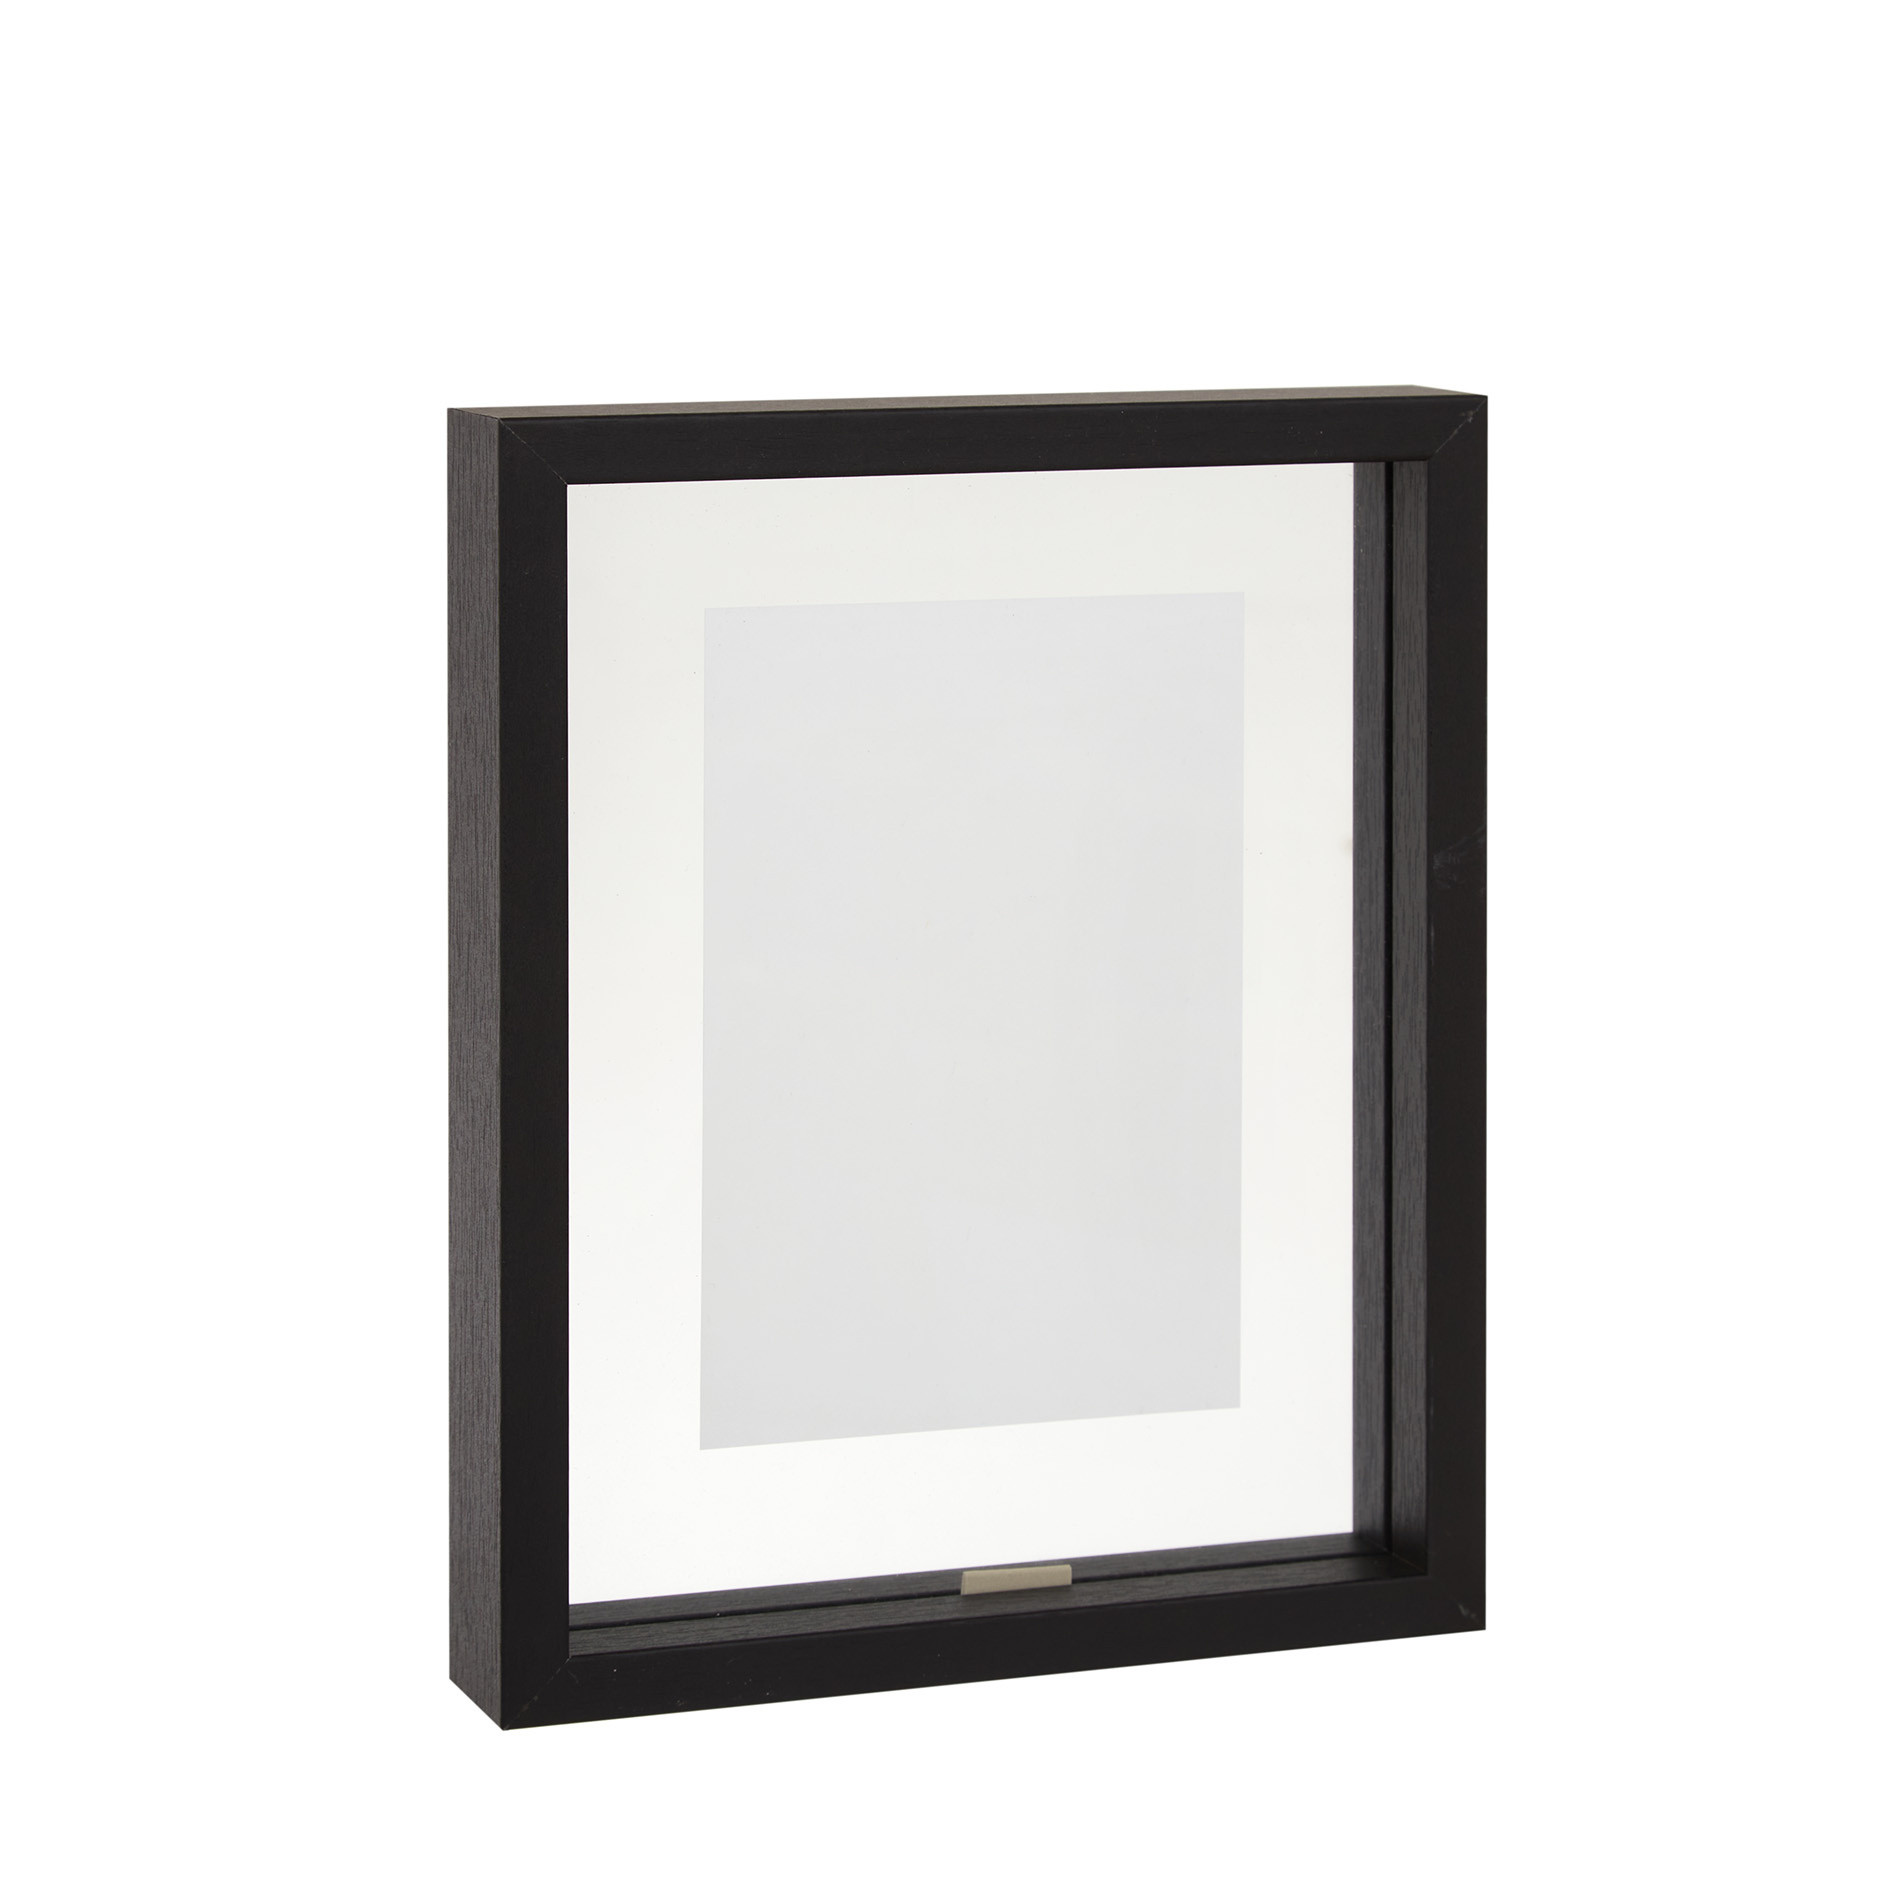 Portafoto cornice colorata, Nero, large image number 0